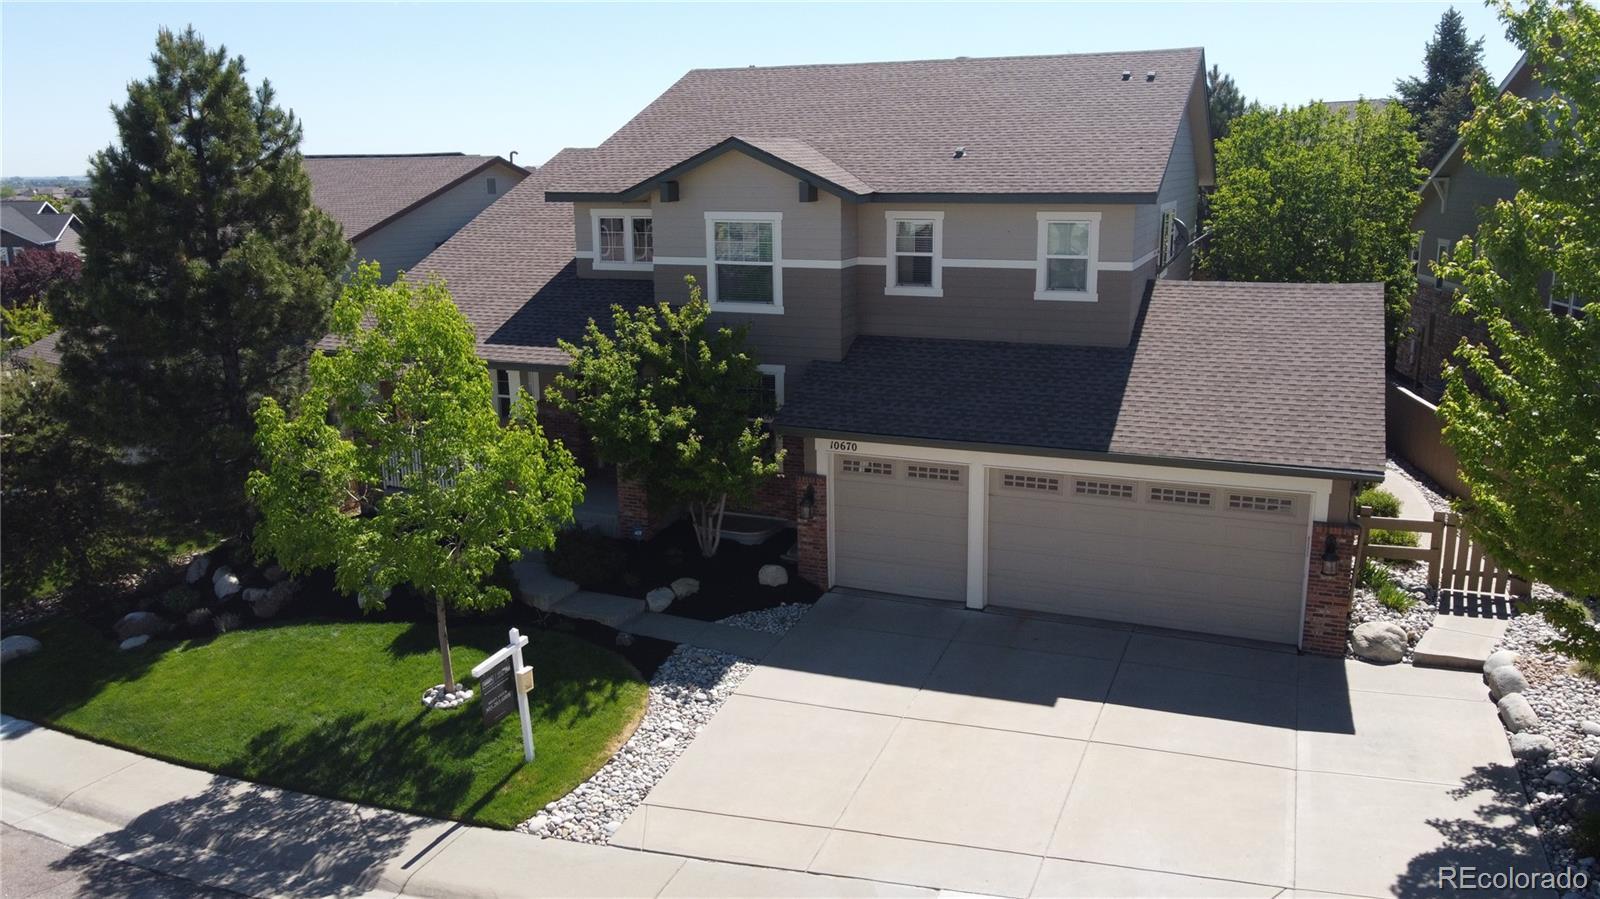 MLS# 3656997 - 1 - 10670 Addison Court, Highlands Ranch, CO 80126